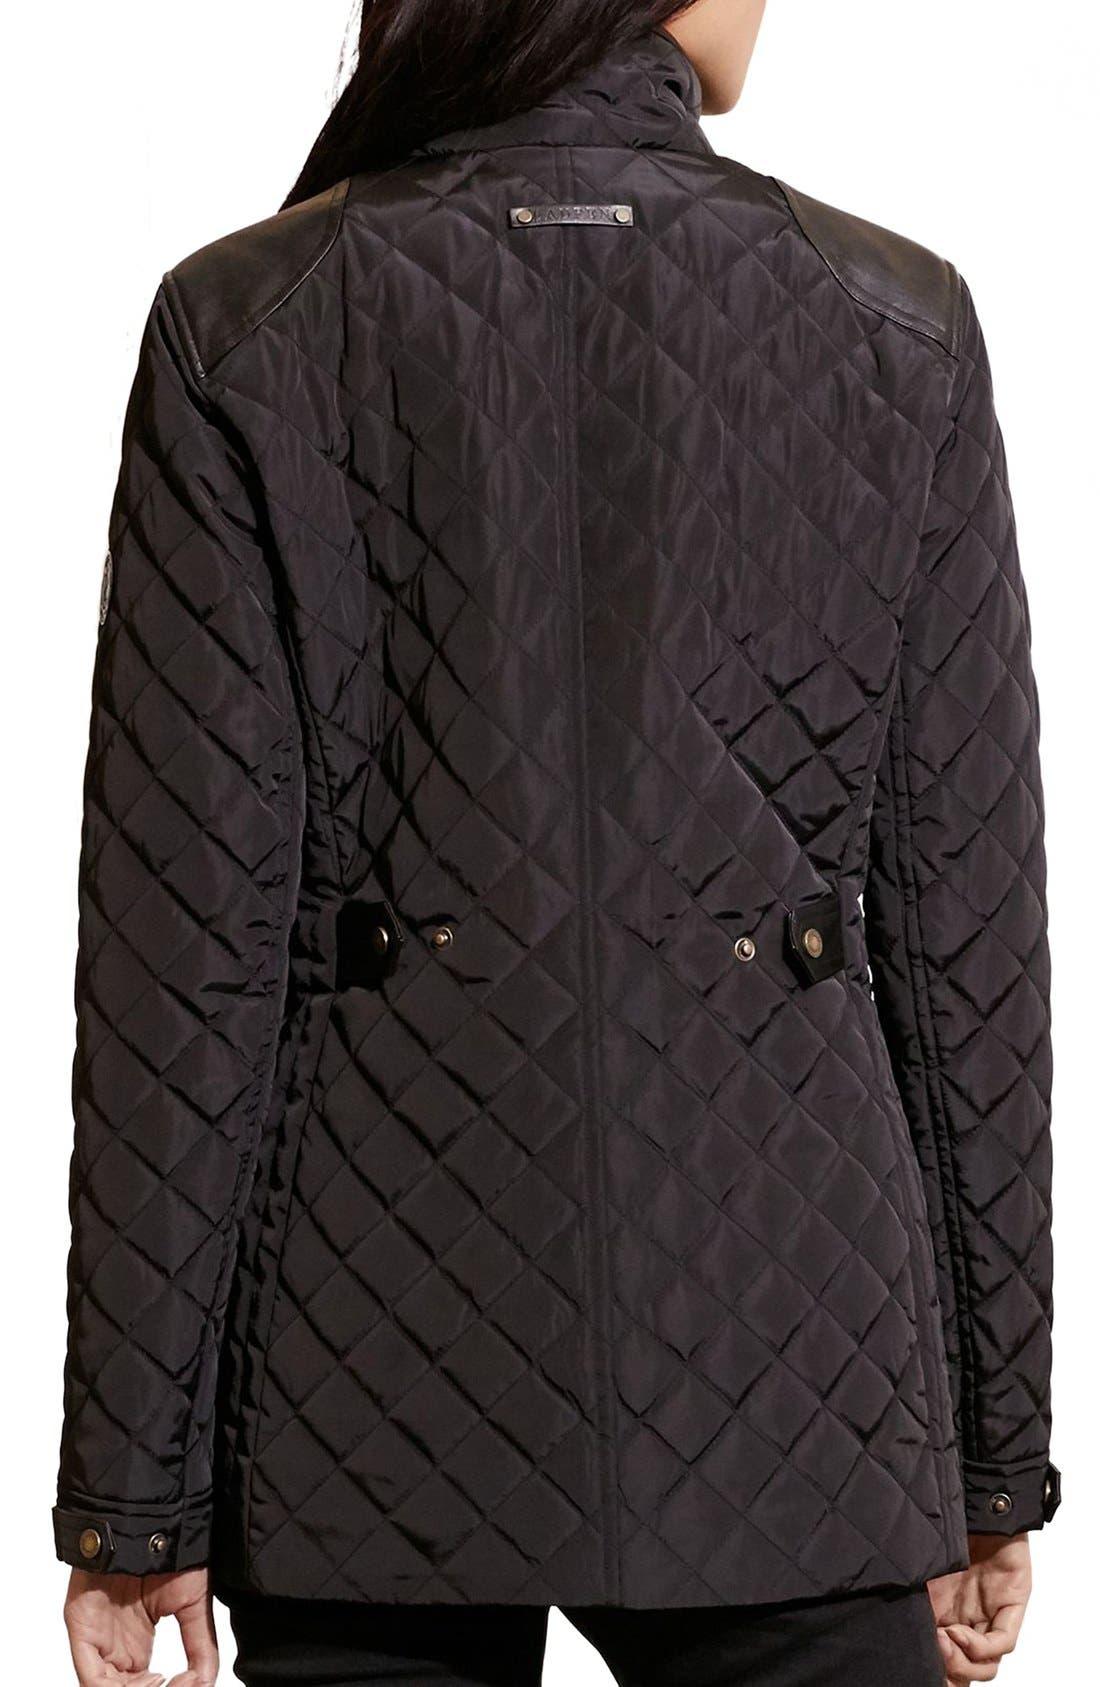 Alternate Image 2  - Lauren Ralph Lauren Diamond Quilted Jacket with Faux Leather Trim (Regular & Petite)